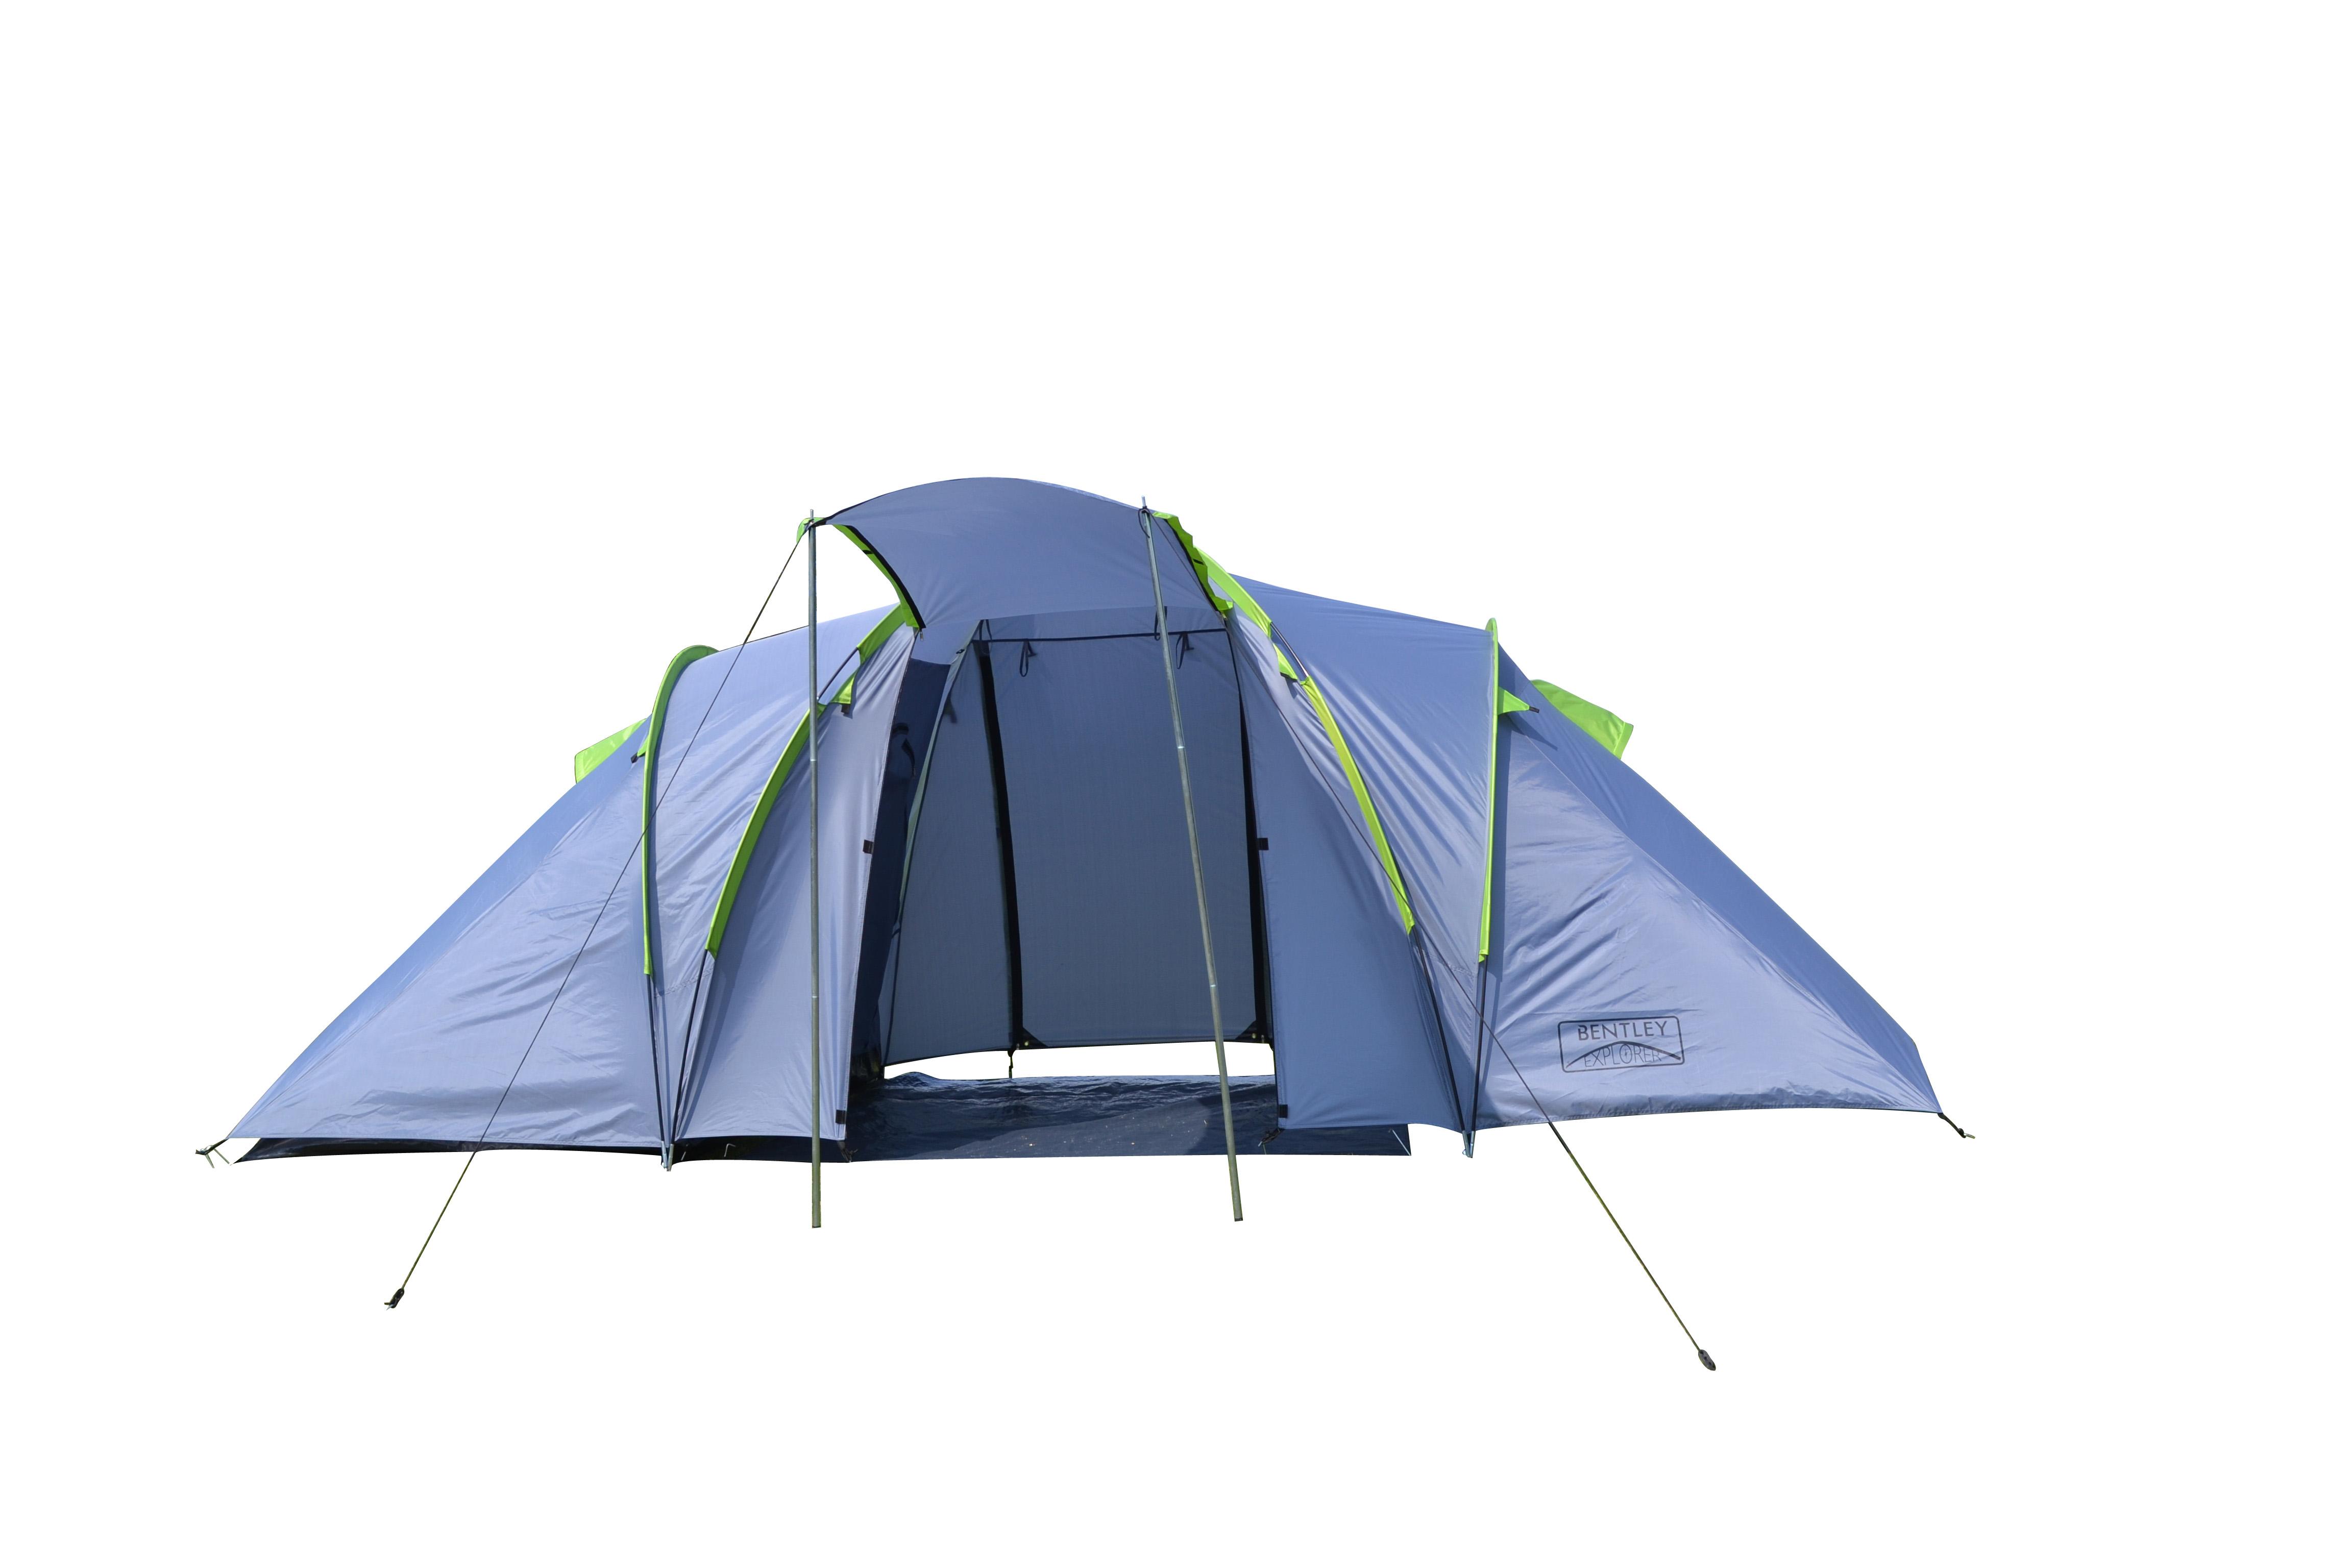 Bentley explorer 4 personne quatre homme family camping for Tente 4 personnes 2 chambres